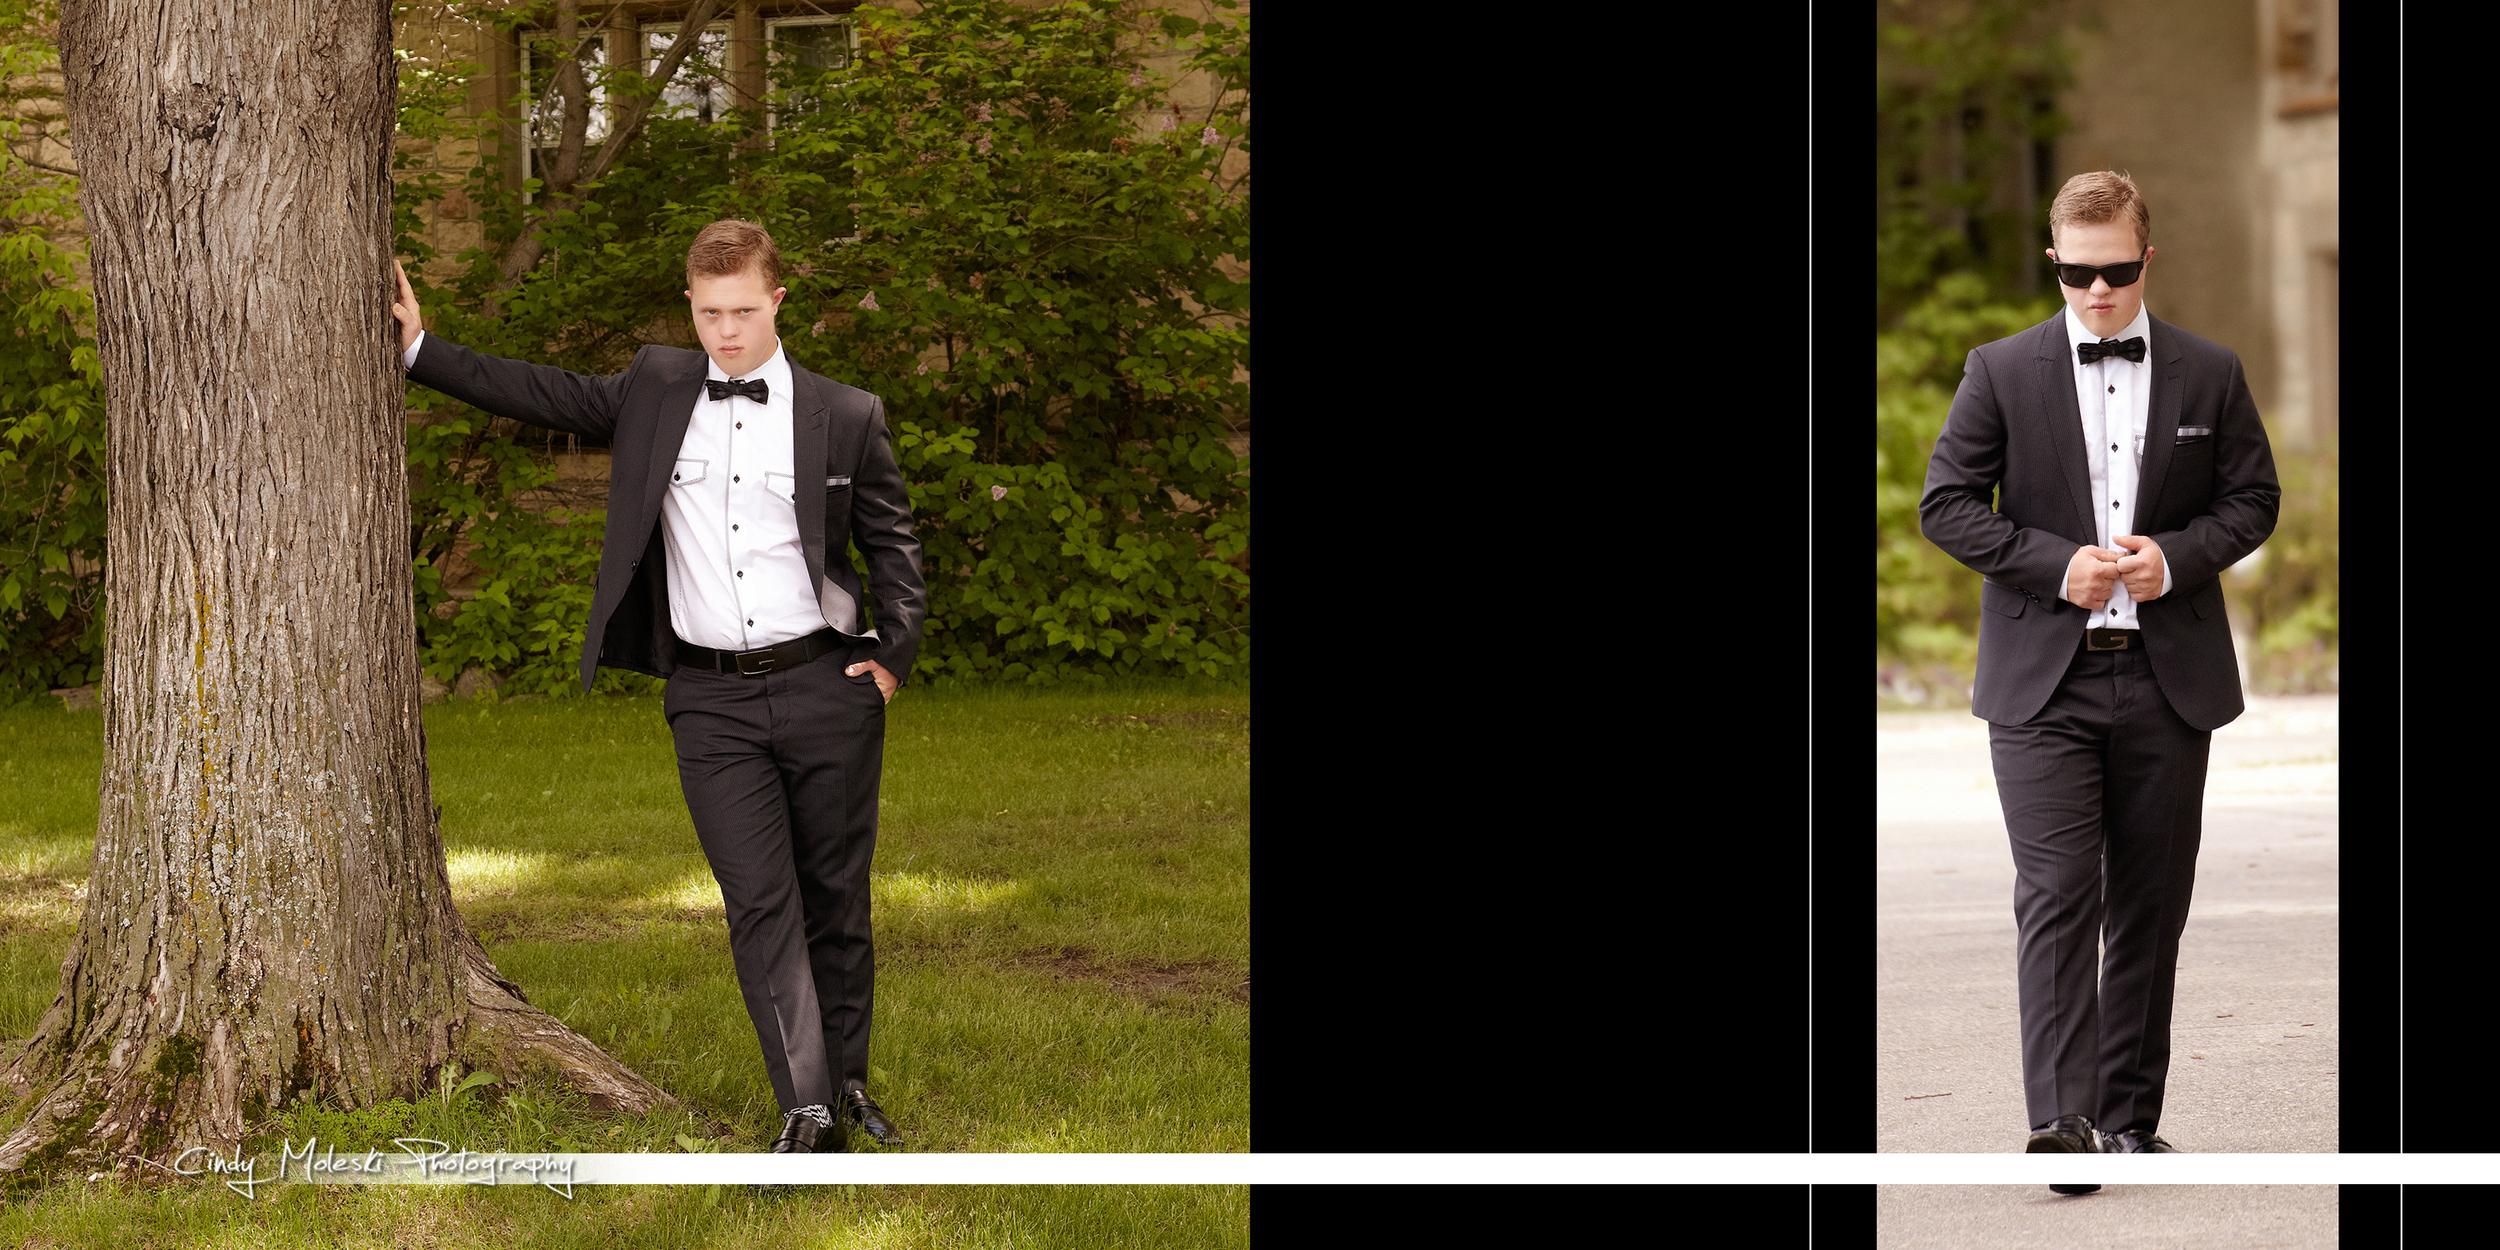 professional-grad-photographer-saskatoon-cindy-moleski-Berg 28046 page 005.jpg